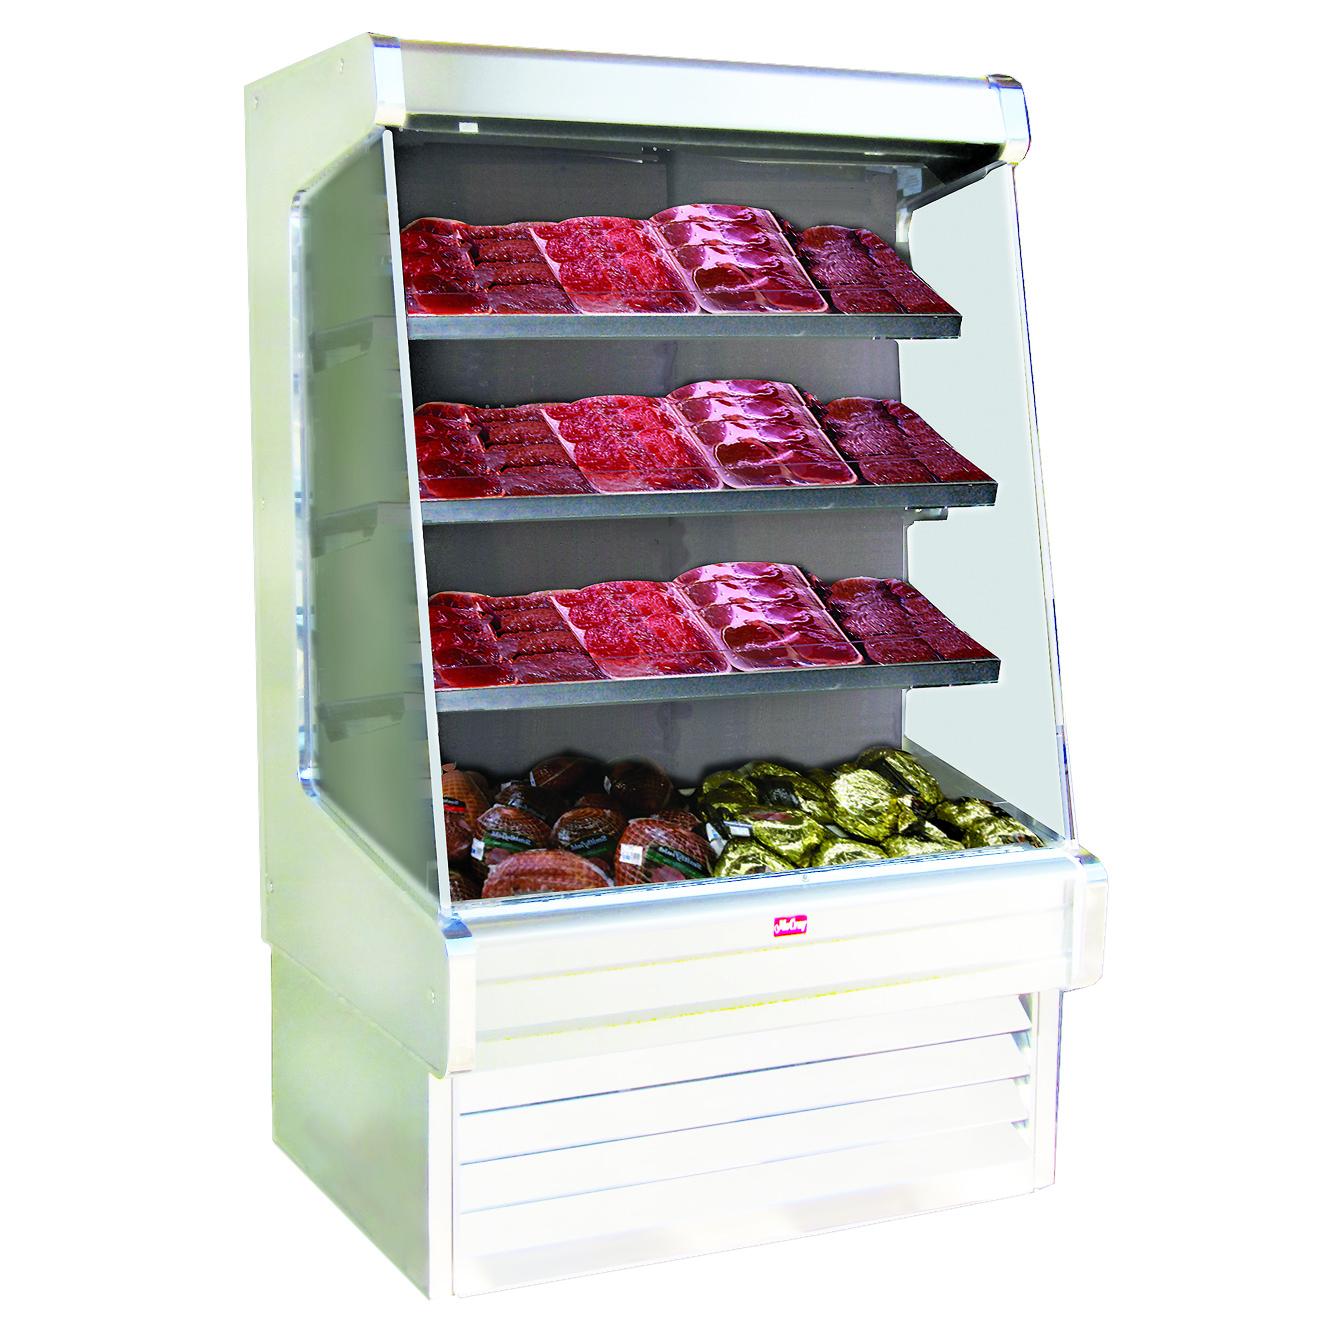 Howard-McCray R-OM30E-12-LED merchandiser, open refrigerated display